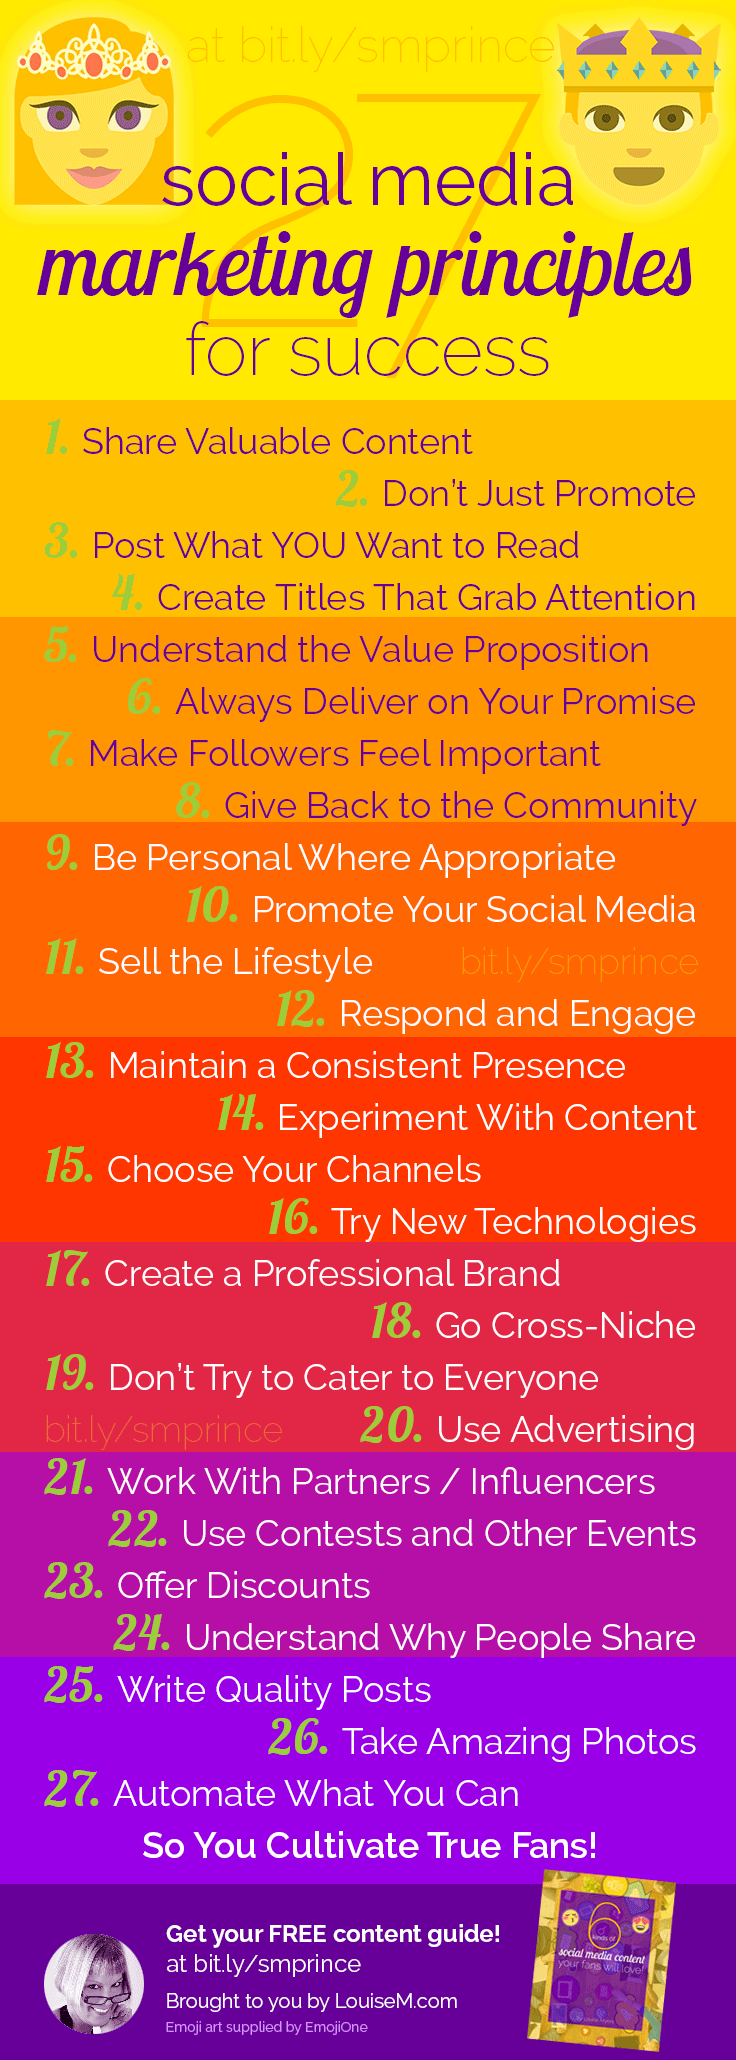 social media principles infographic